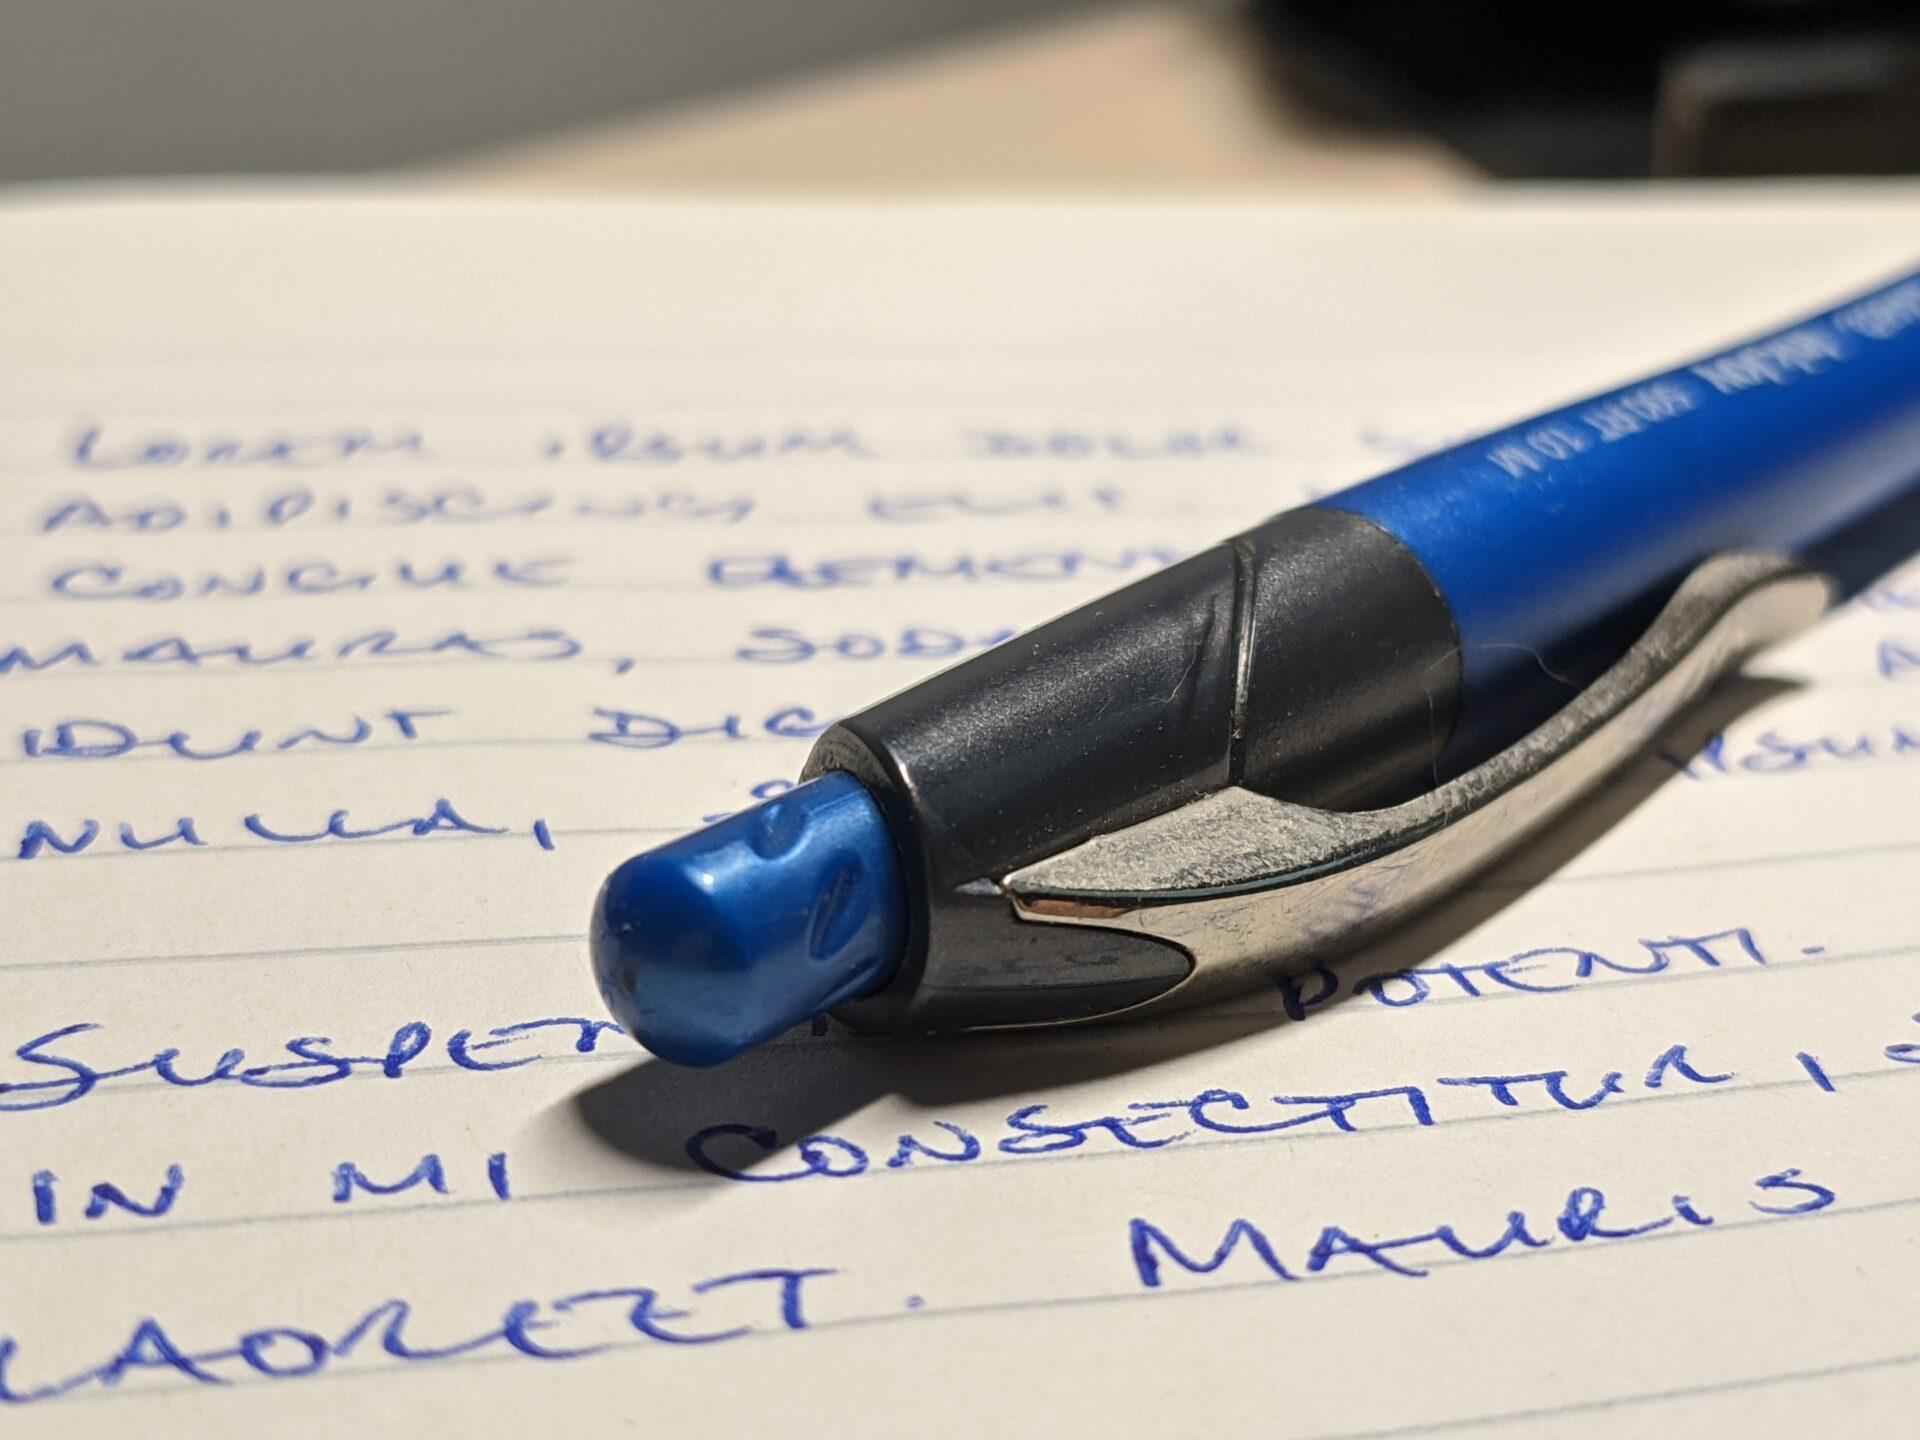 A photo of a pen.